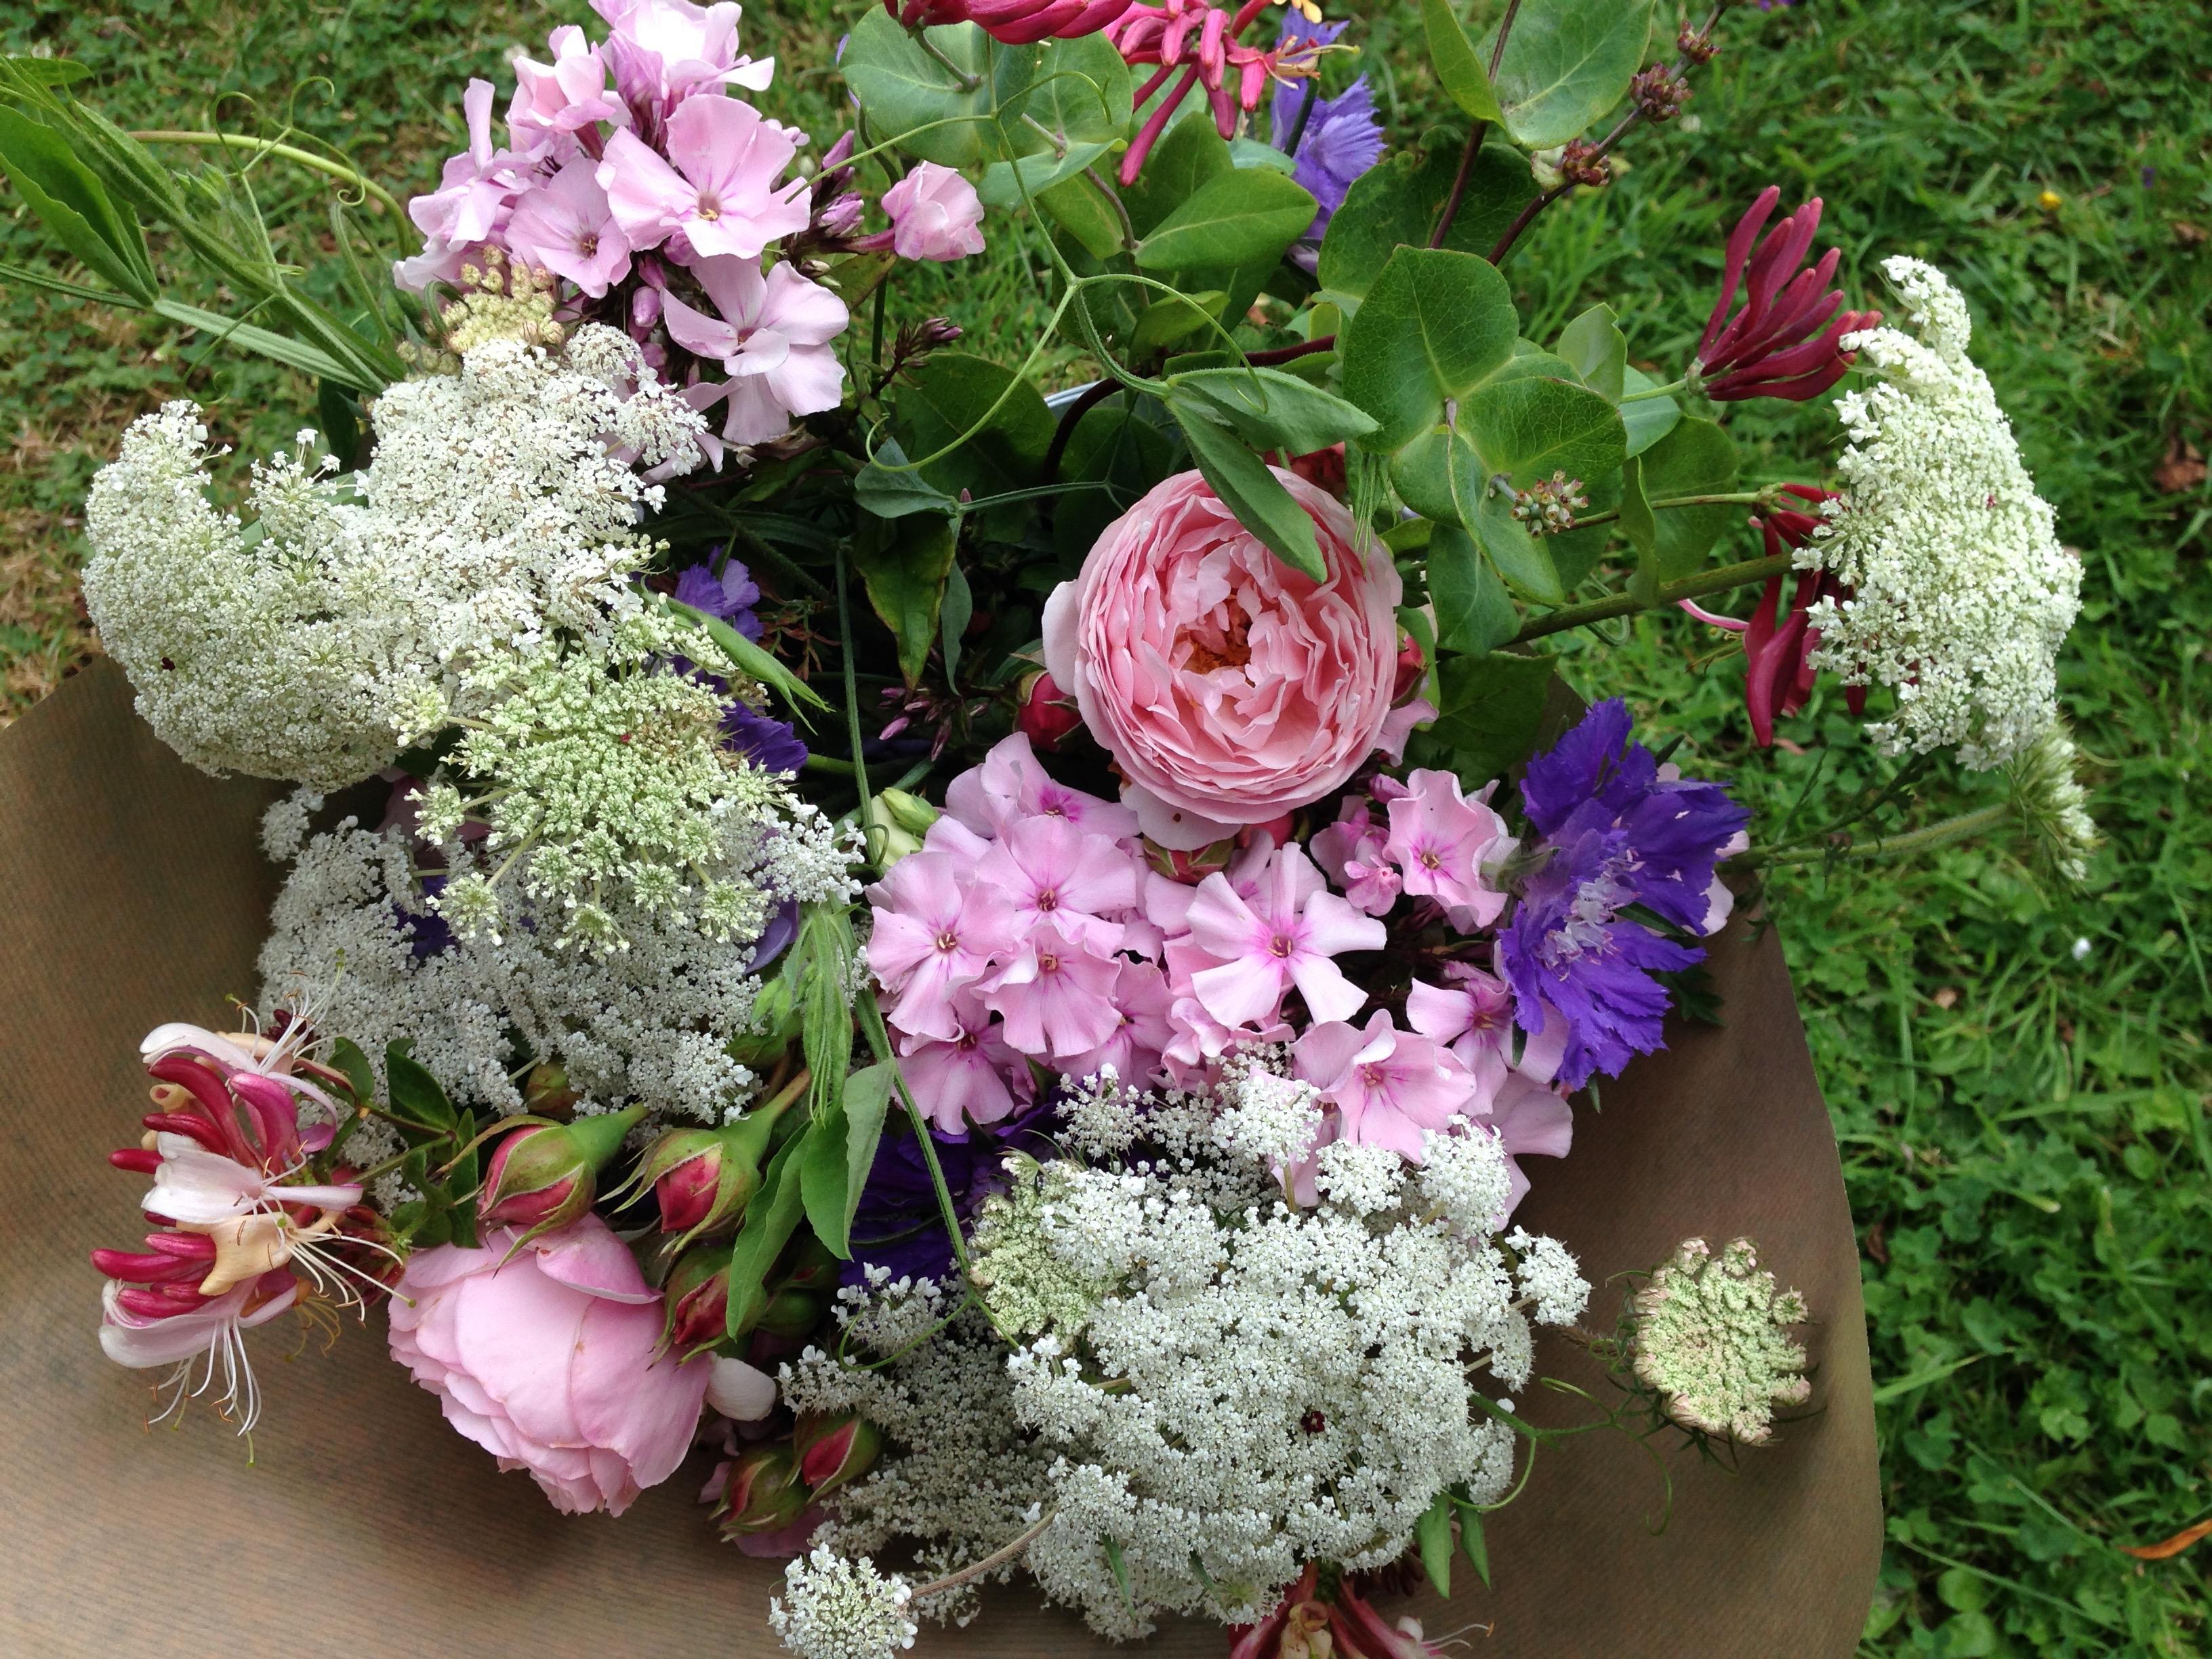 Summer-scented-bouquet